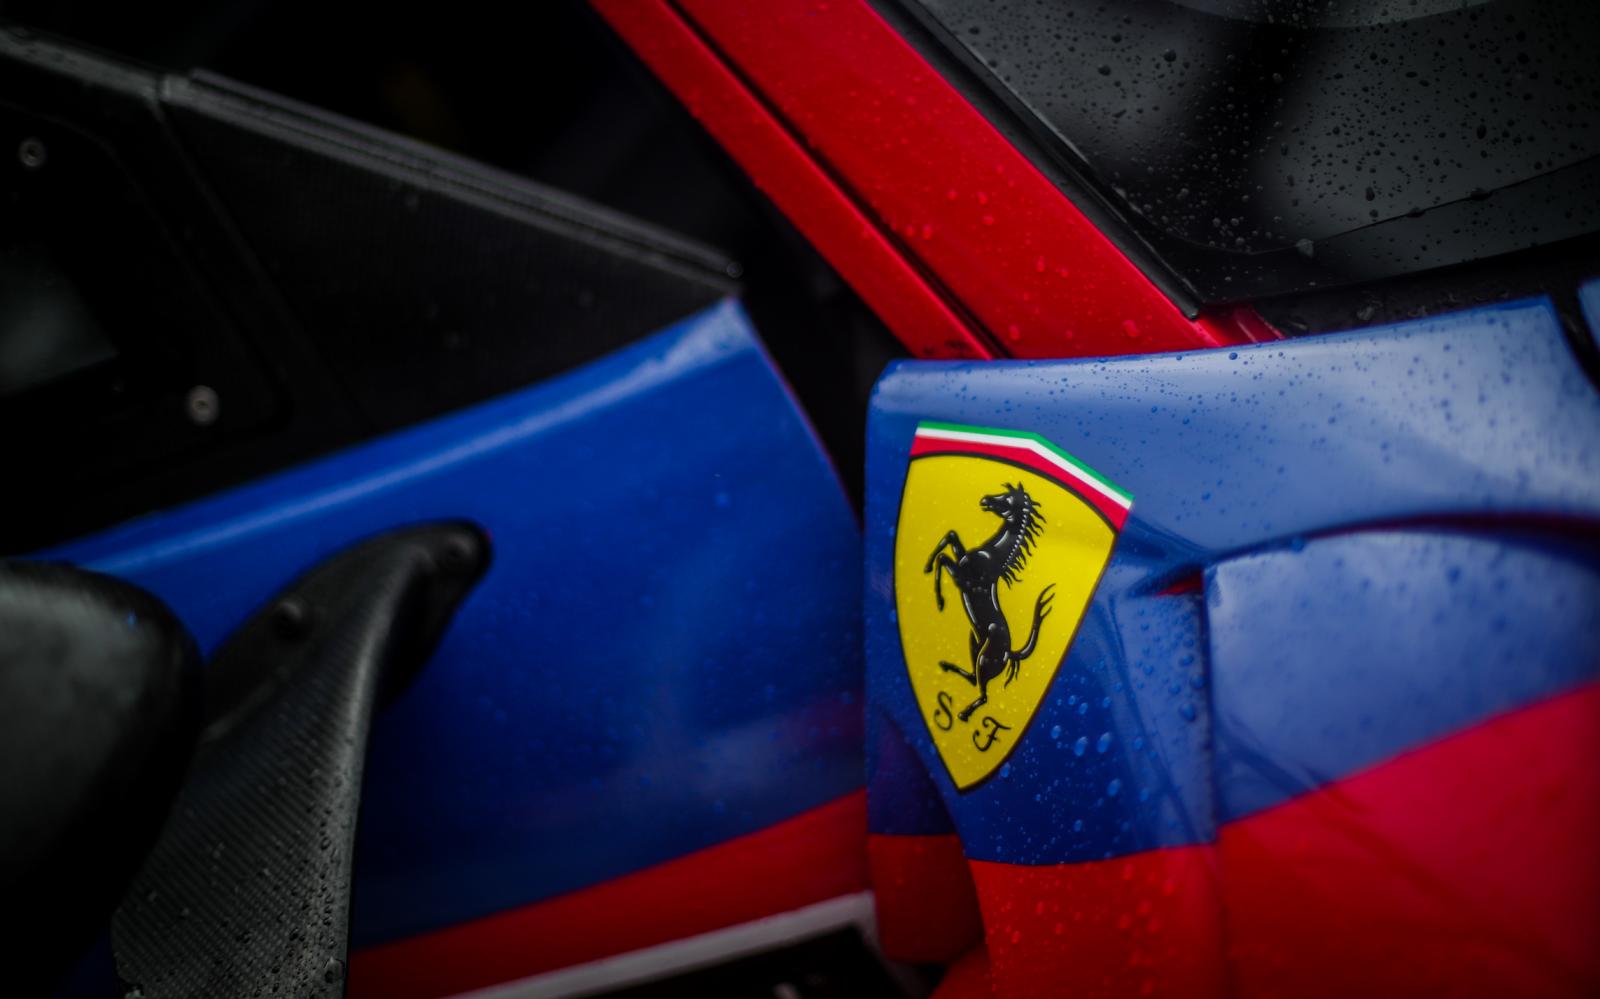 Iron Lynx to field two-car Ferrari assault on Endurance Cup